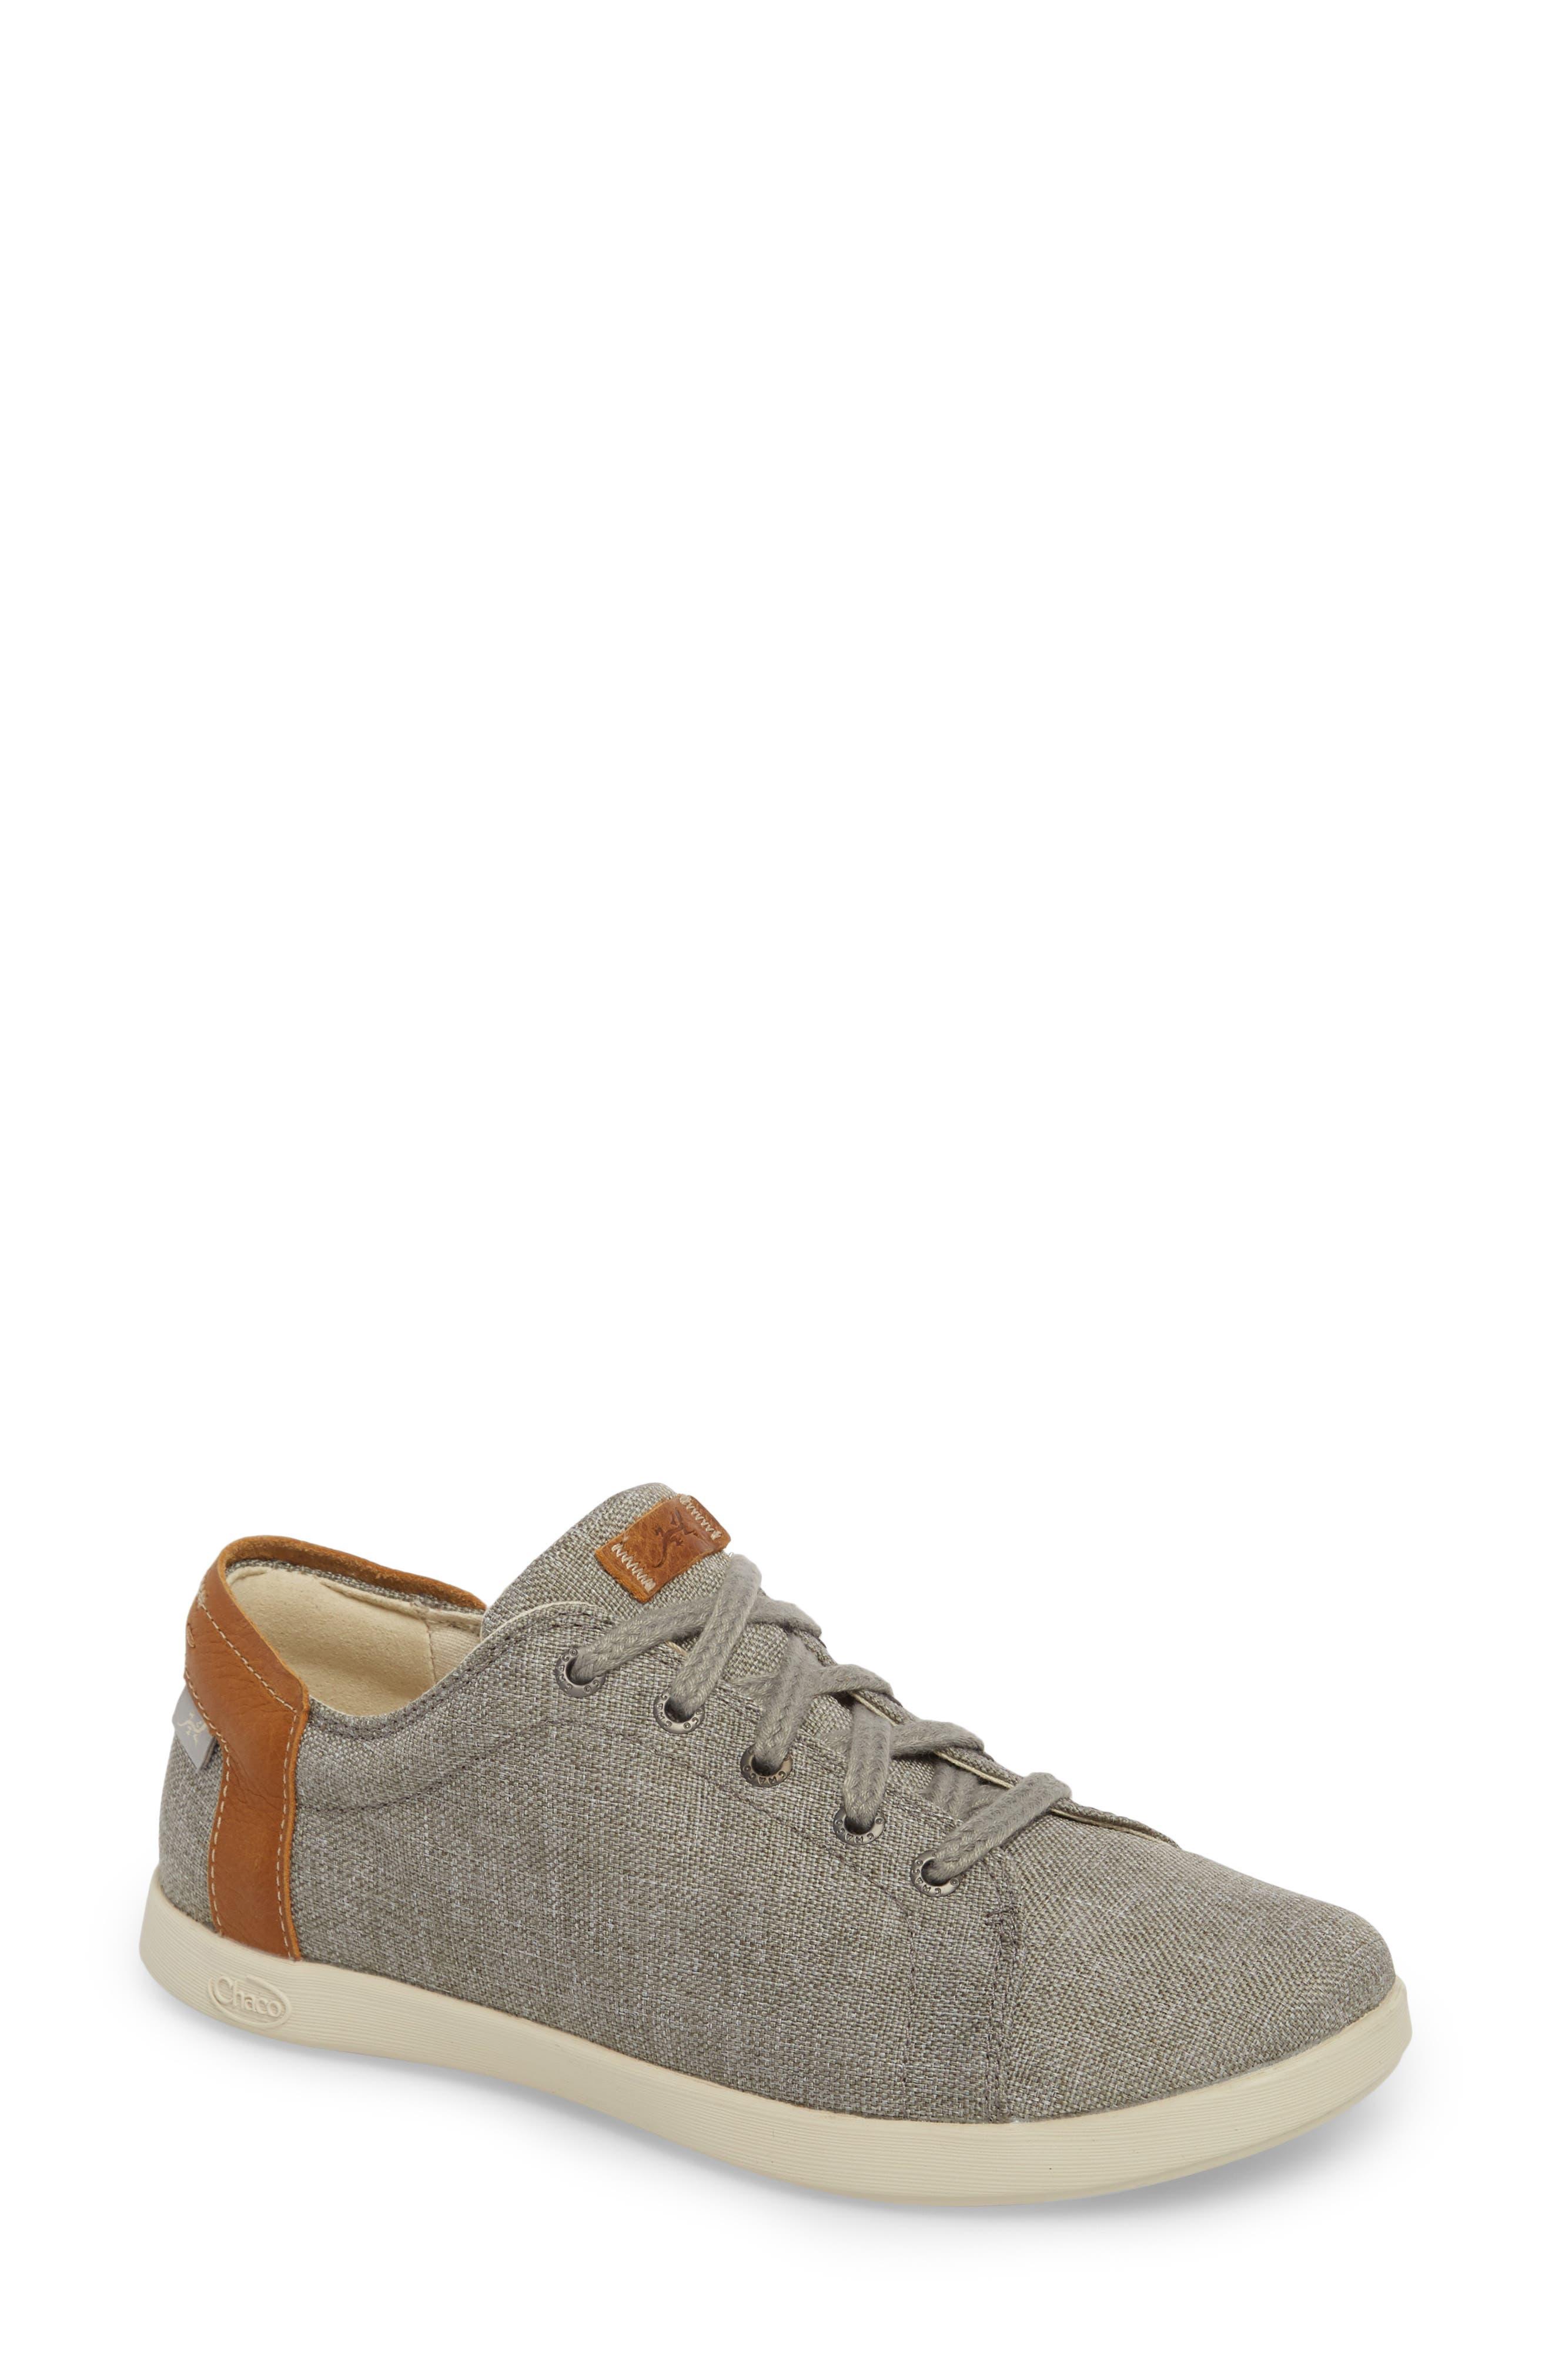 Ionia Sneaker,                         Main,                         color, Gray Canvas